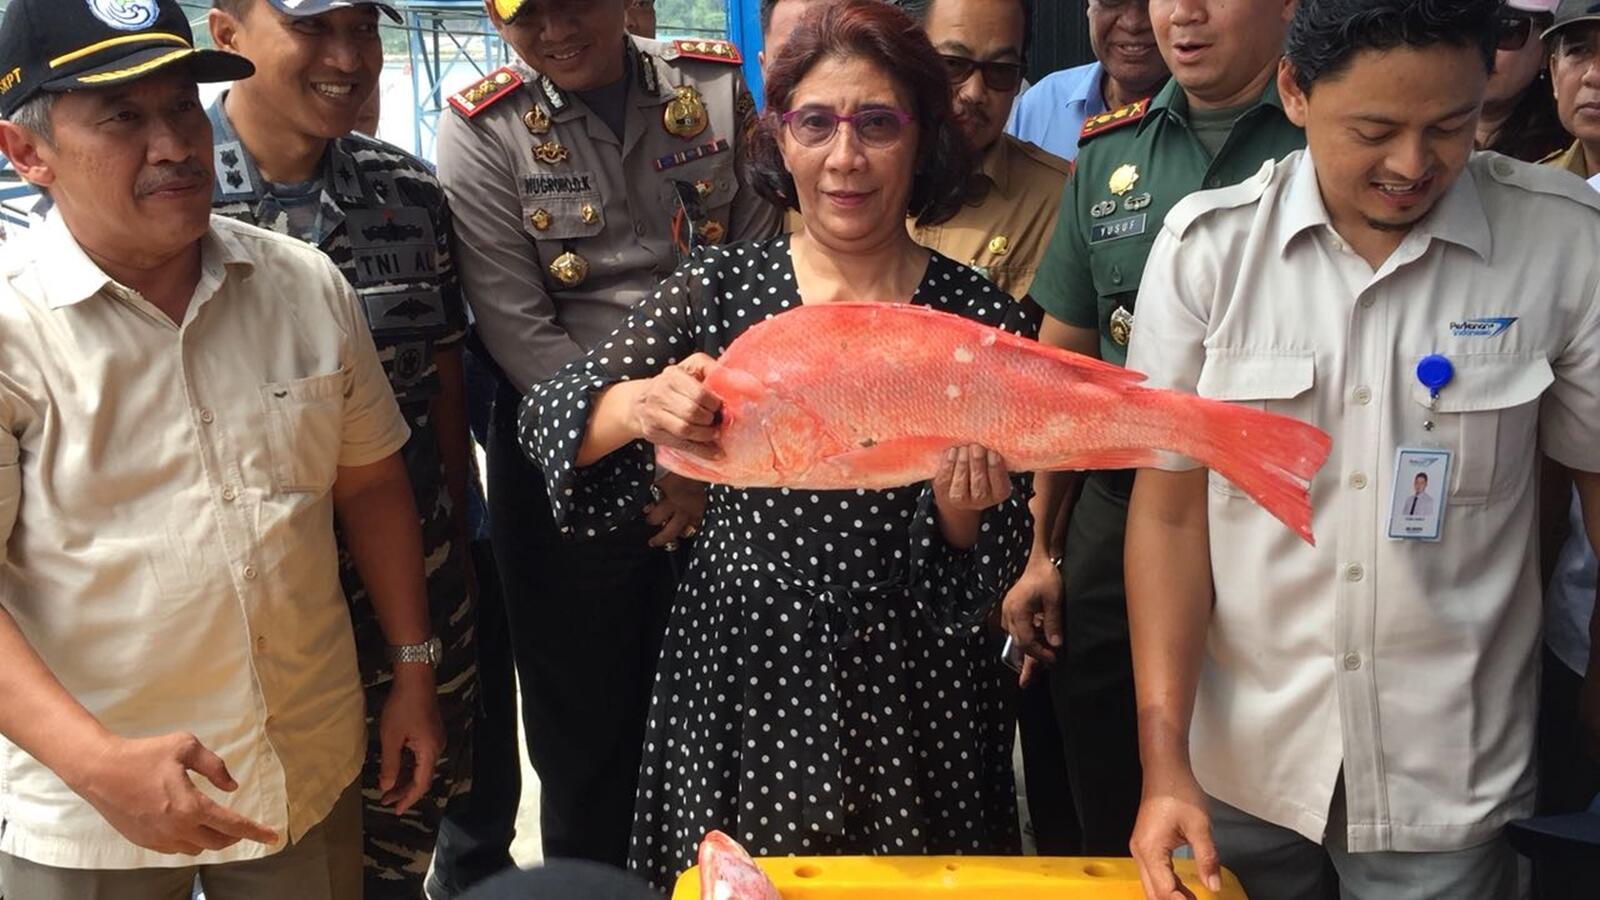 Kementerian Susi Pudjiastuti Upayakan Pajak 0% untuk Ekspor Ikan ke UE